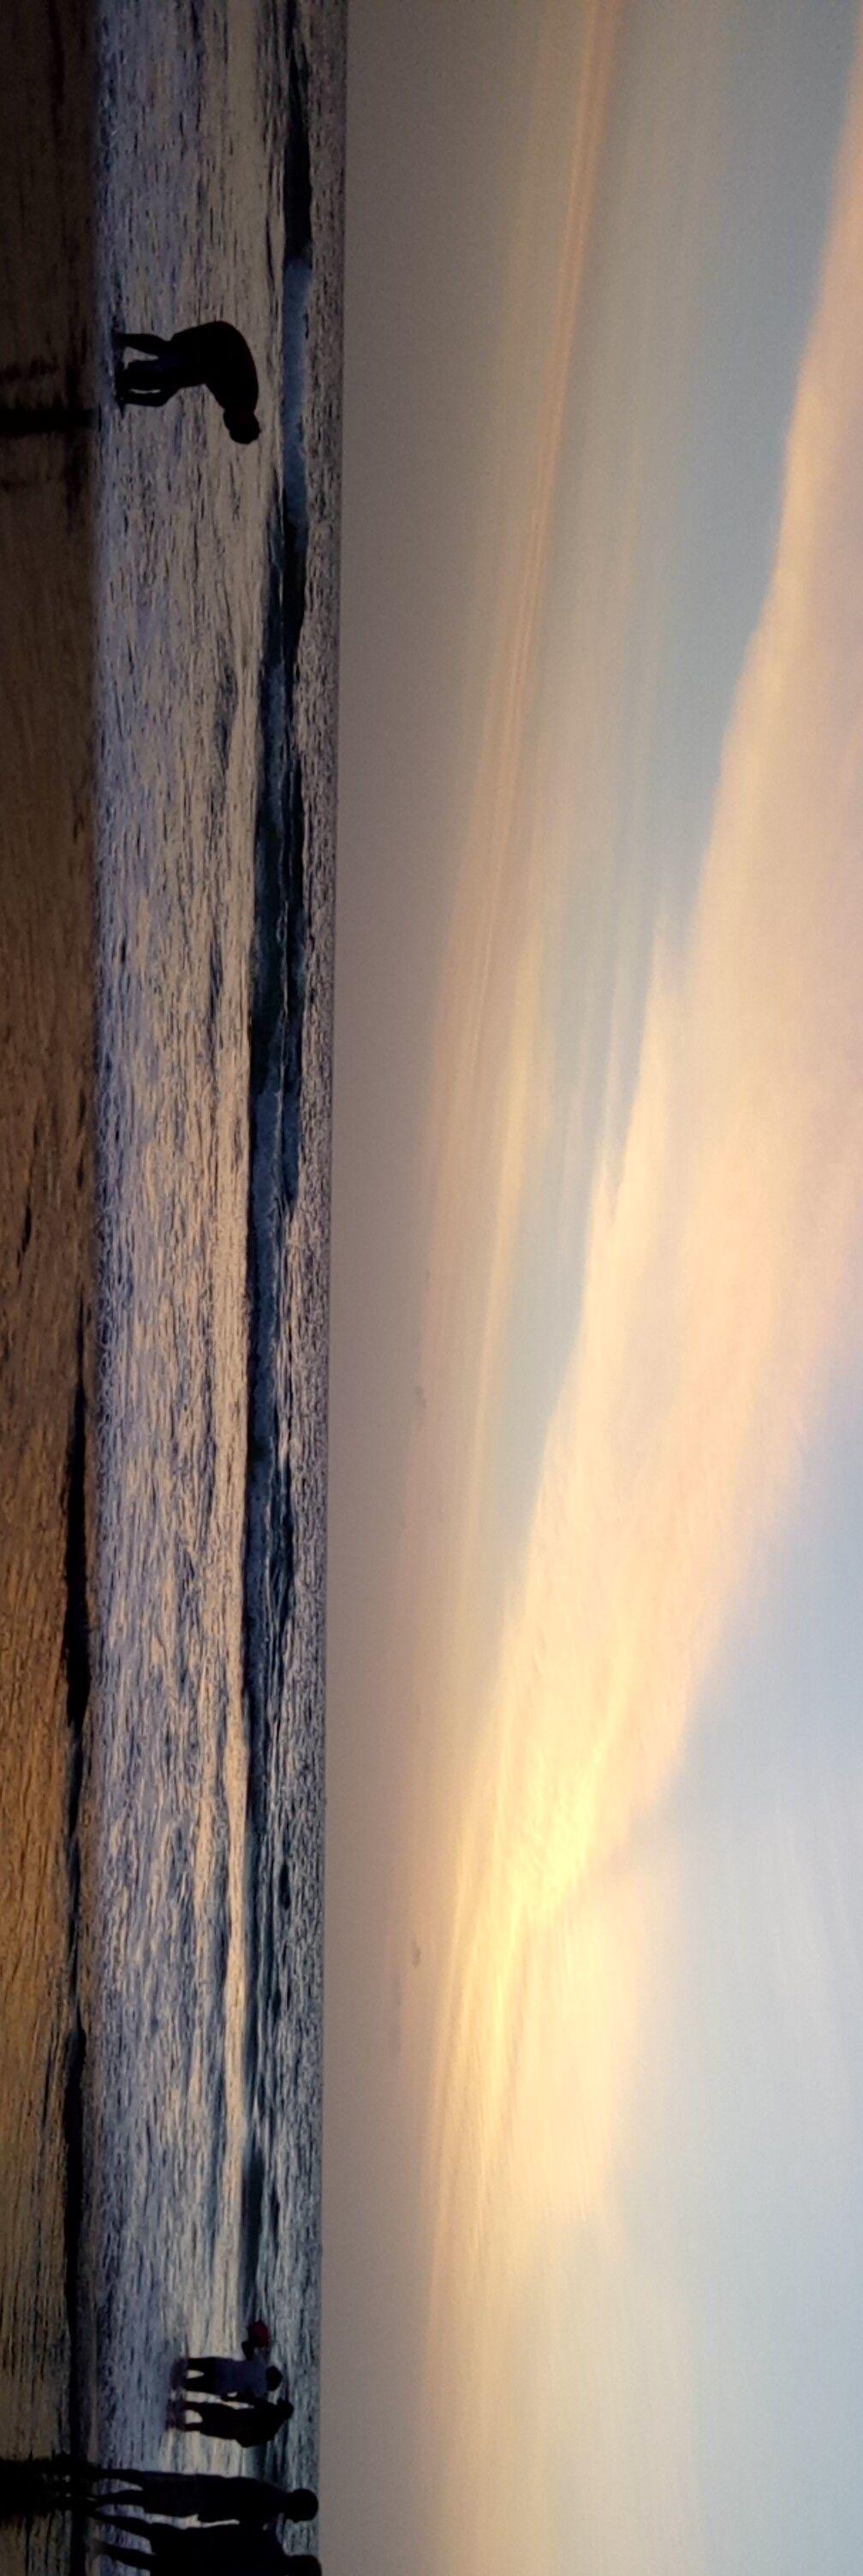 Photo of Colva Beach By Ritu Pandya